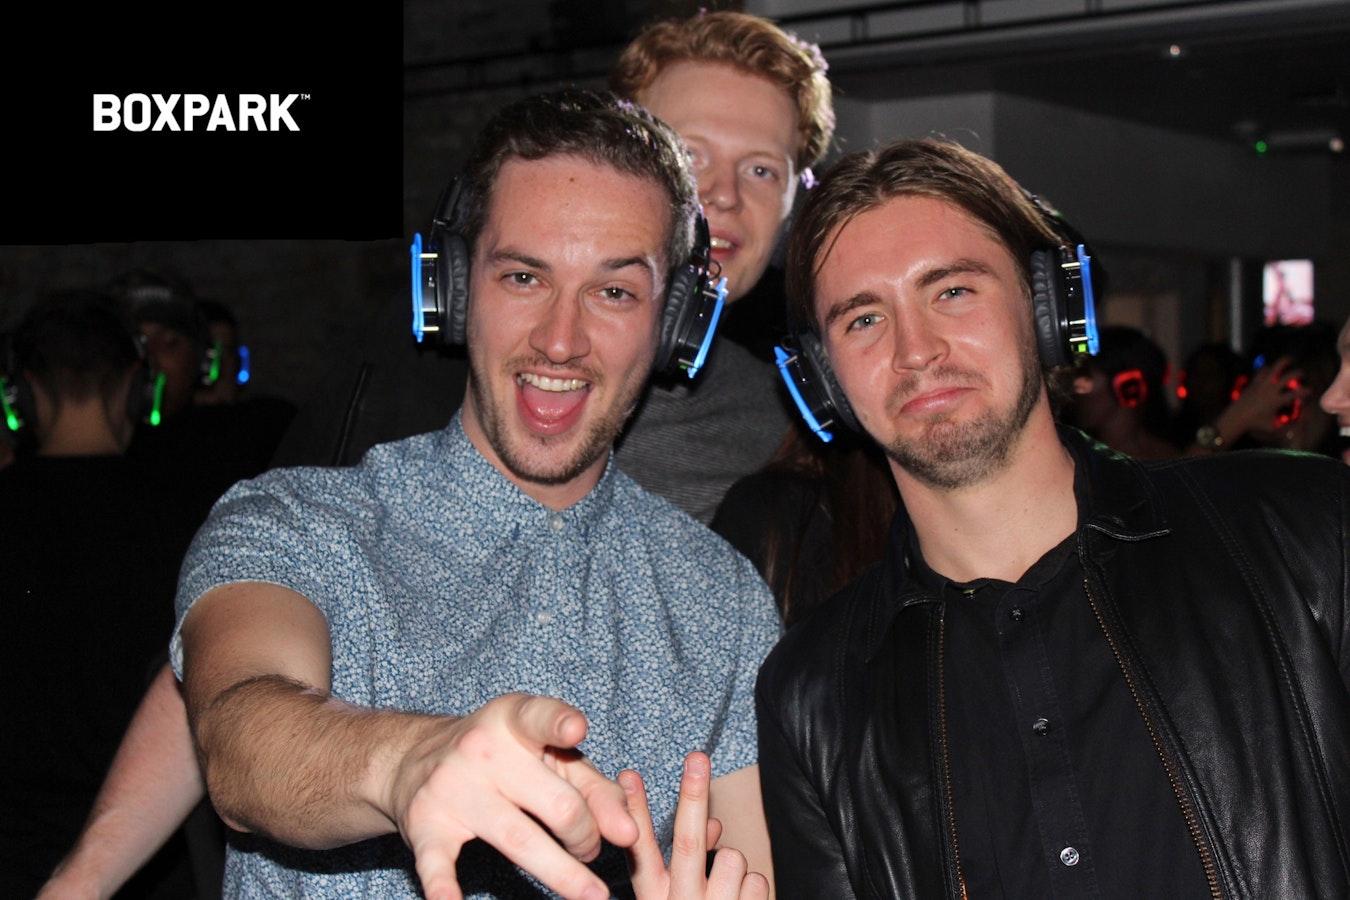 FREE Headphone Party @Boxpark Croydon